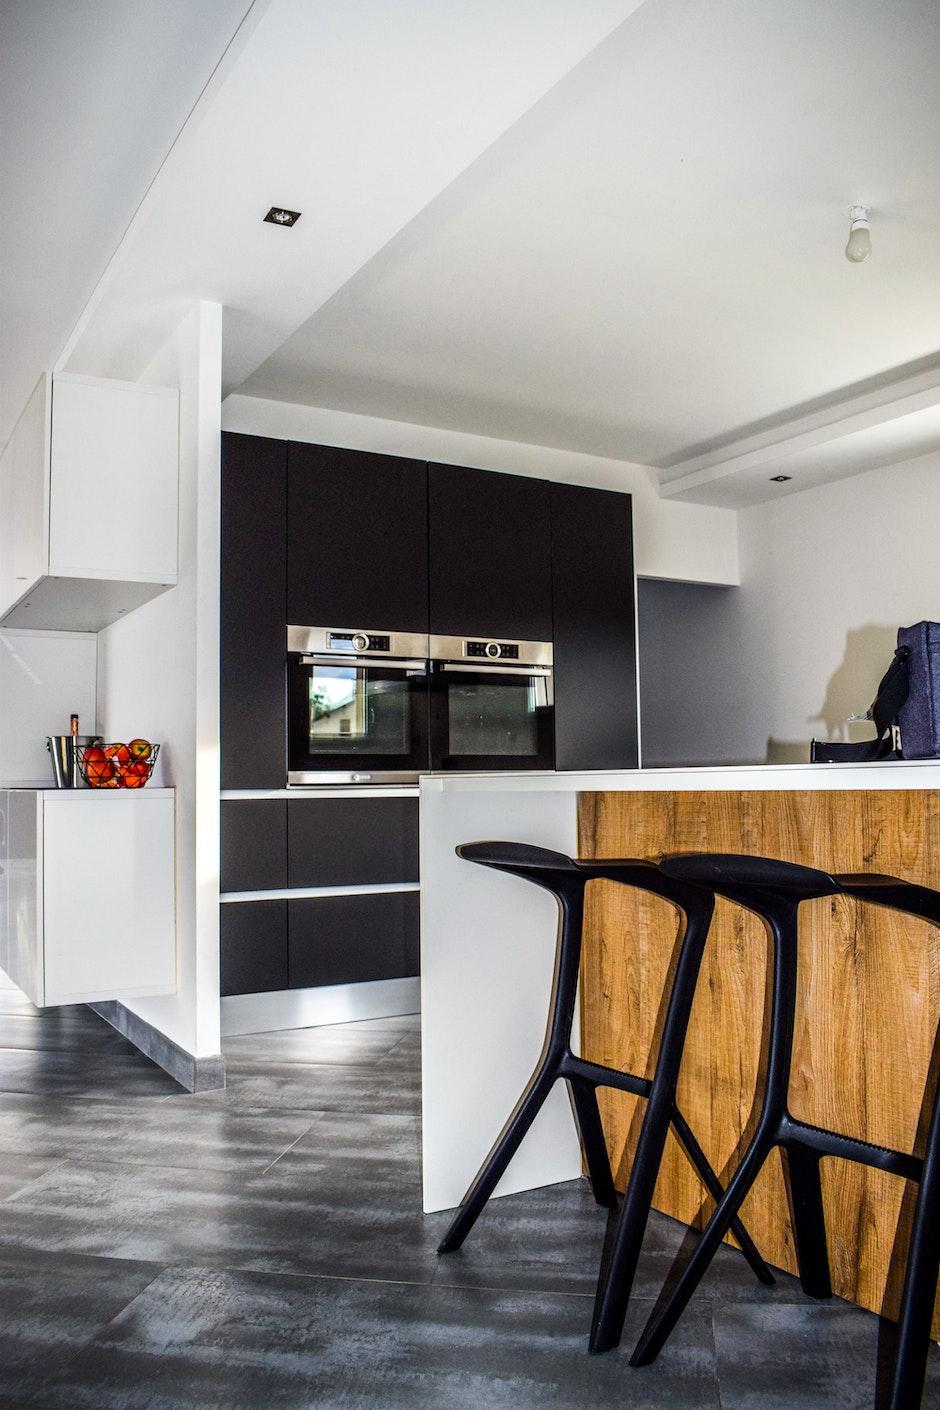 apartment, architecture, cabinets